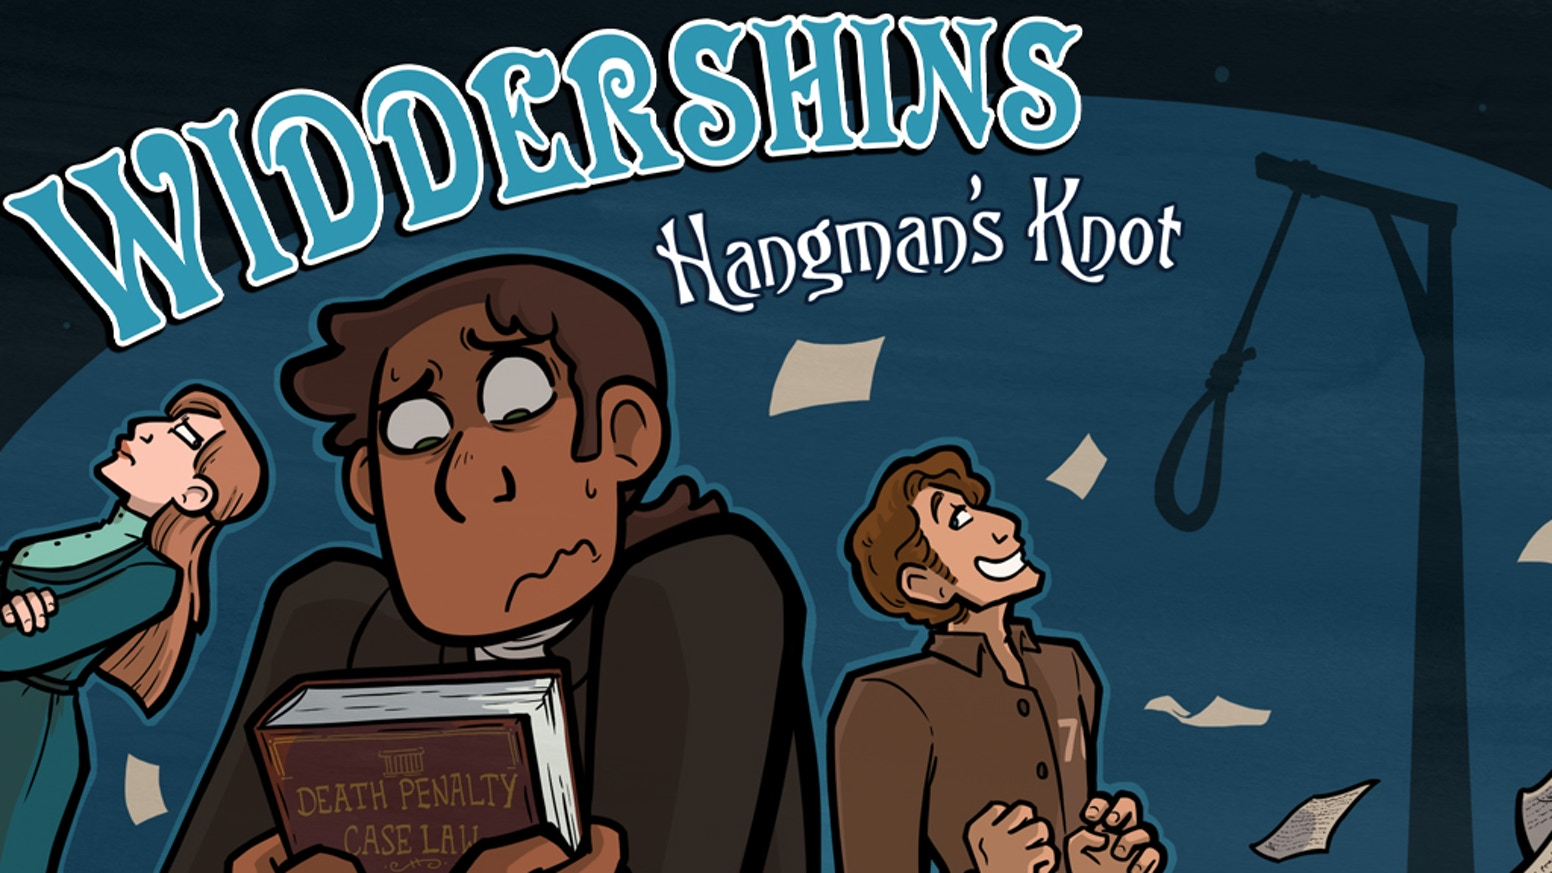 Victorian-era magic and adventure, in the latest printed volume of the webcomic Widdershins!#RecognizeKSRU